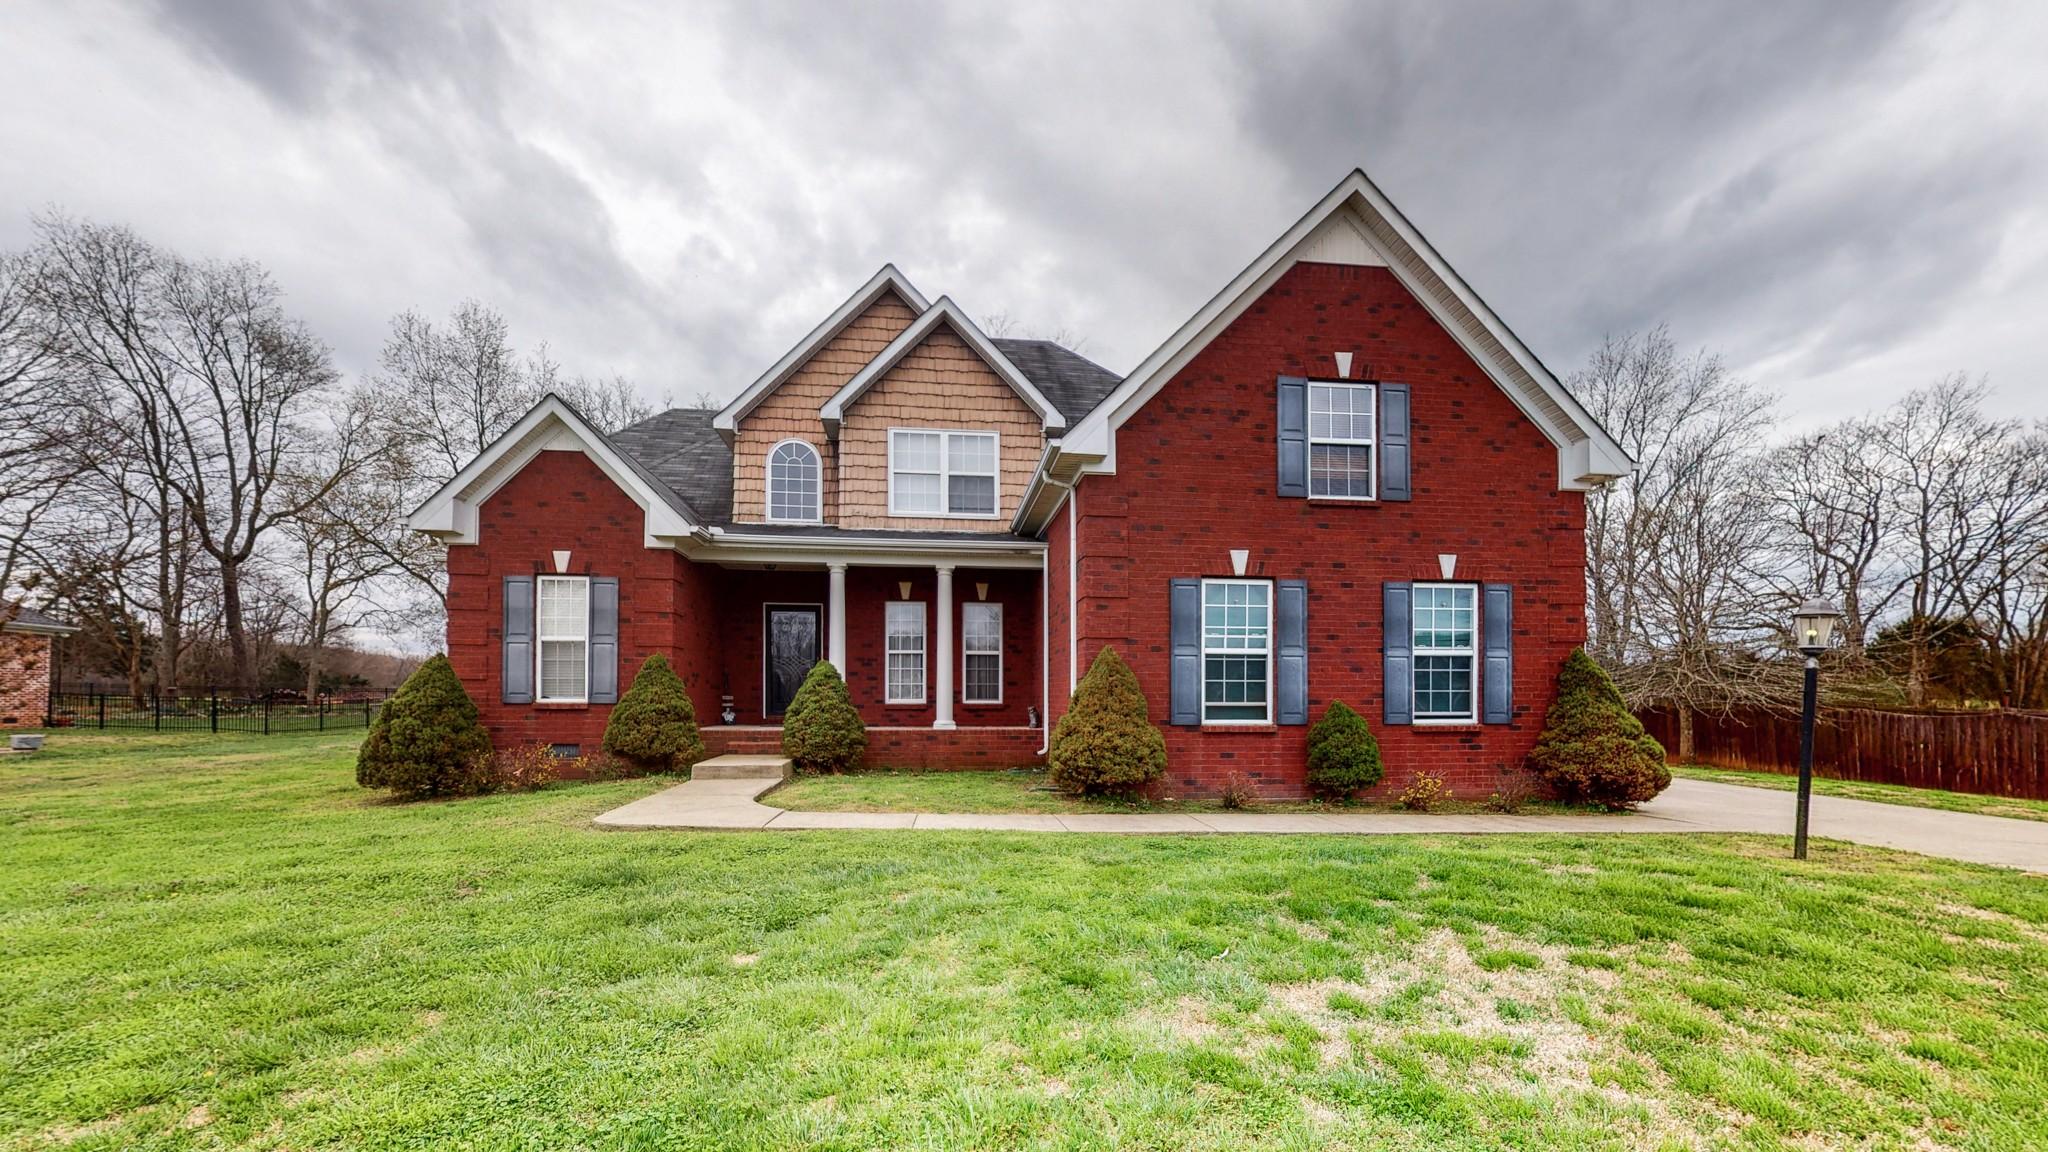 1311 John Hood Dr Property Photo - Rockvale, TN real estate listing